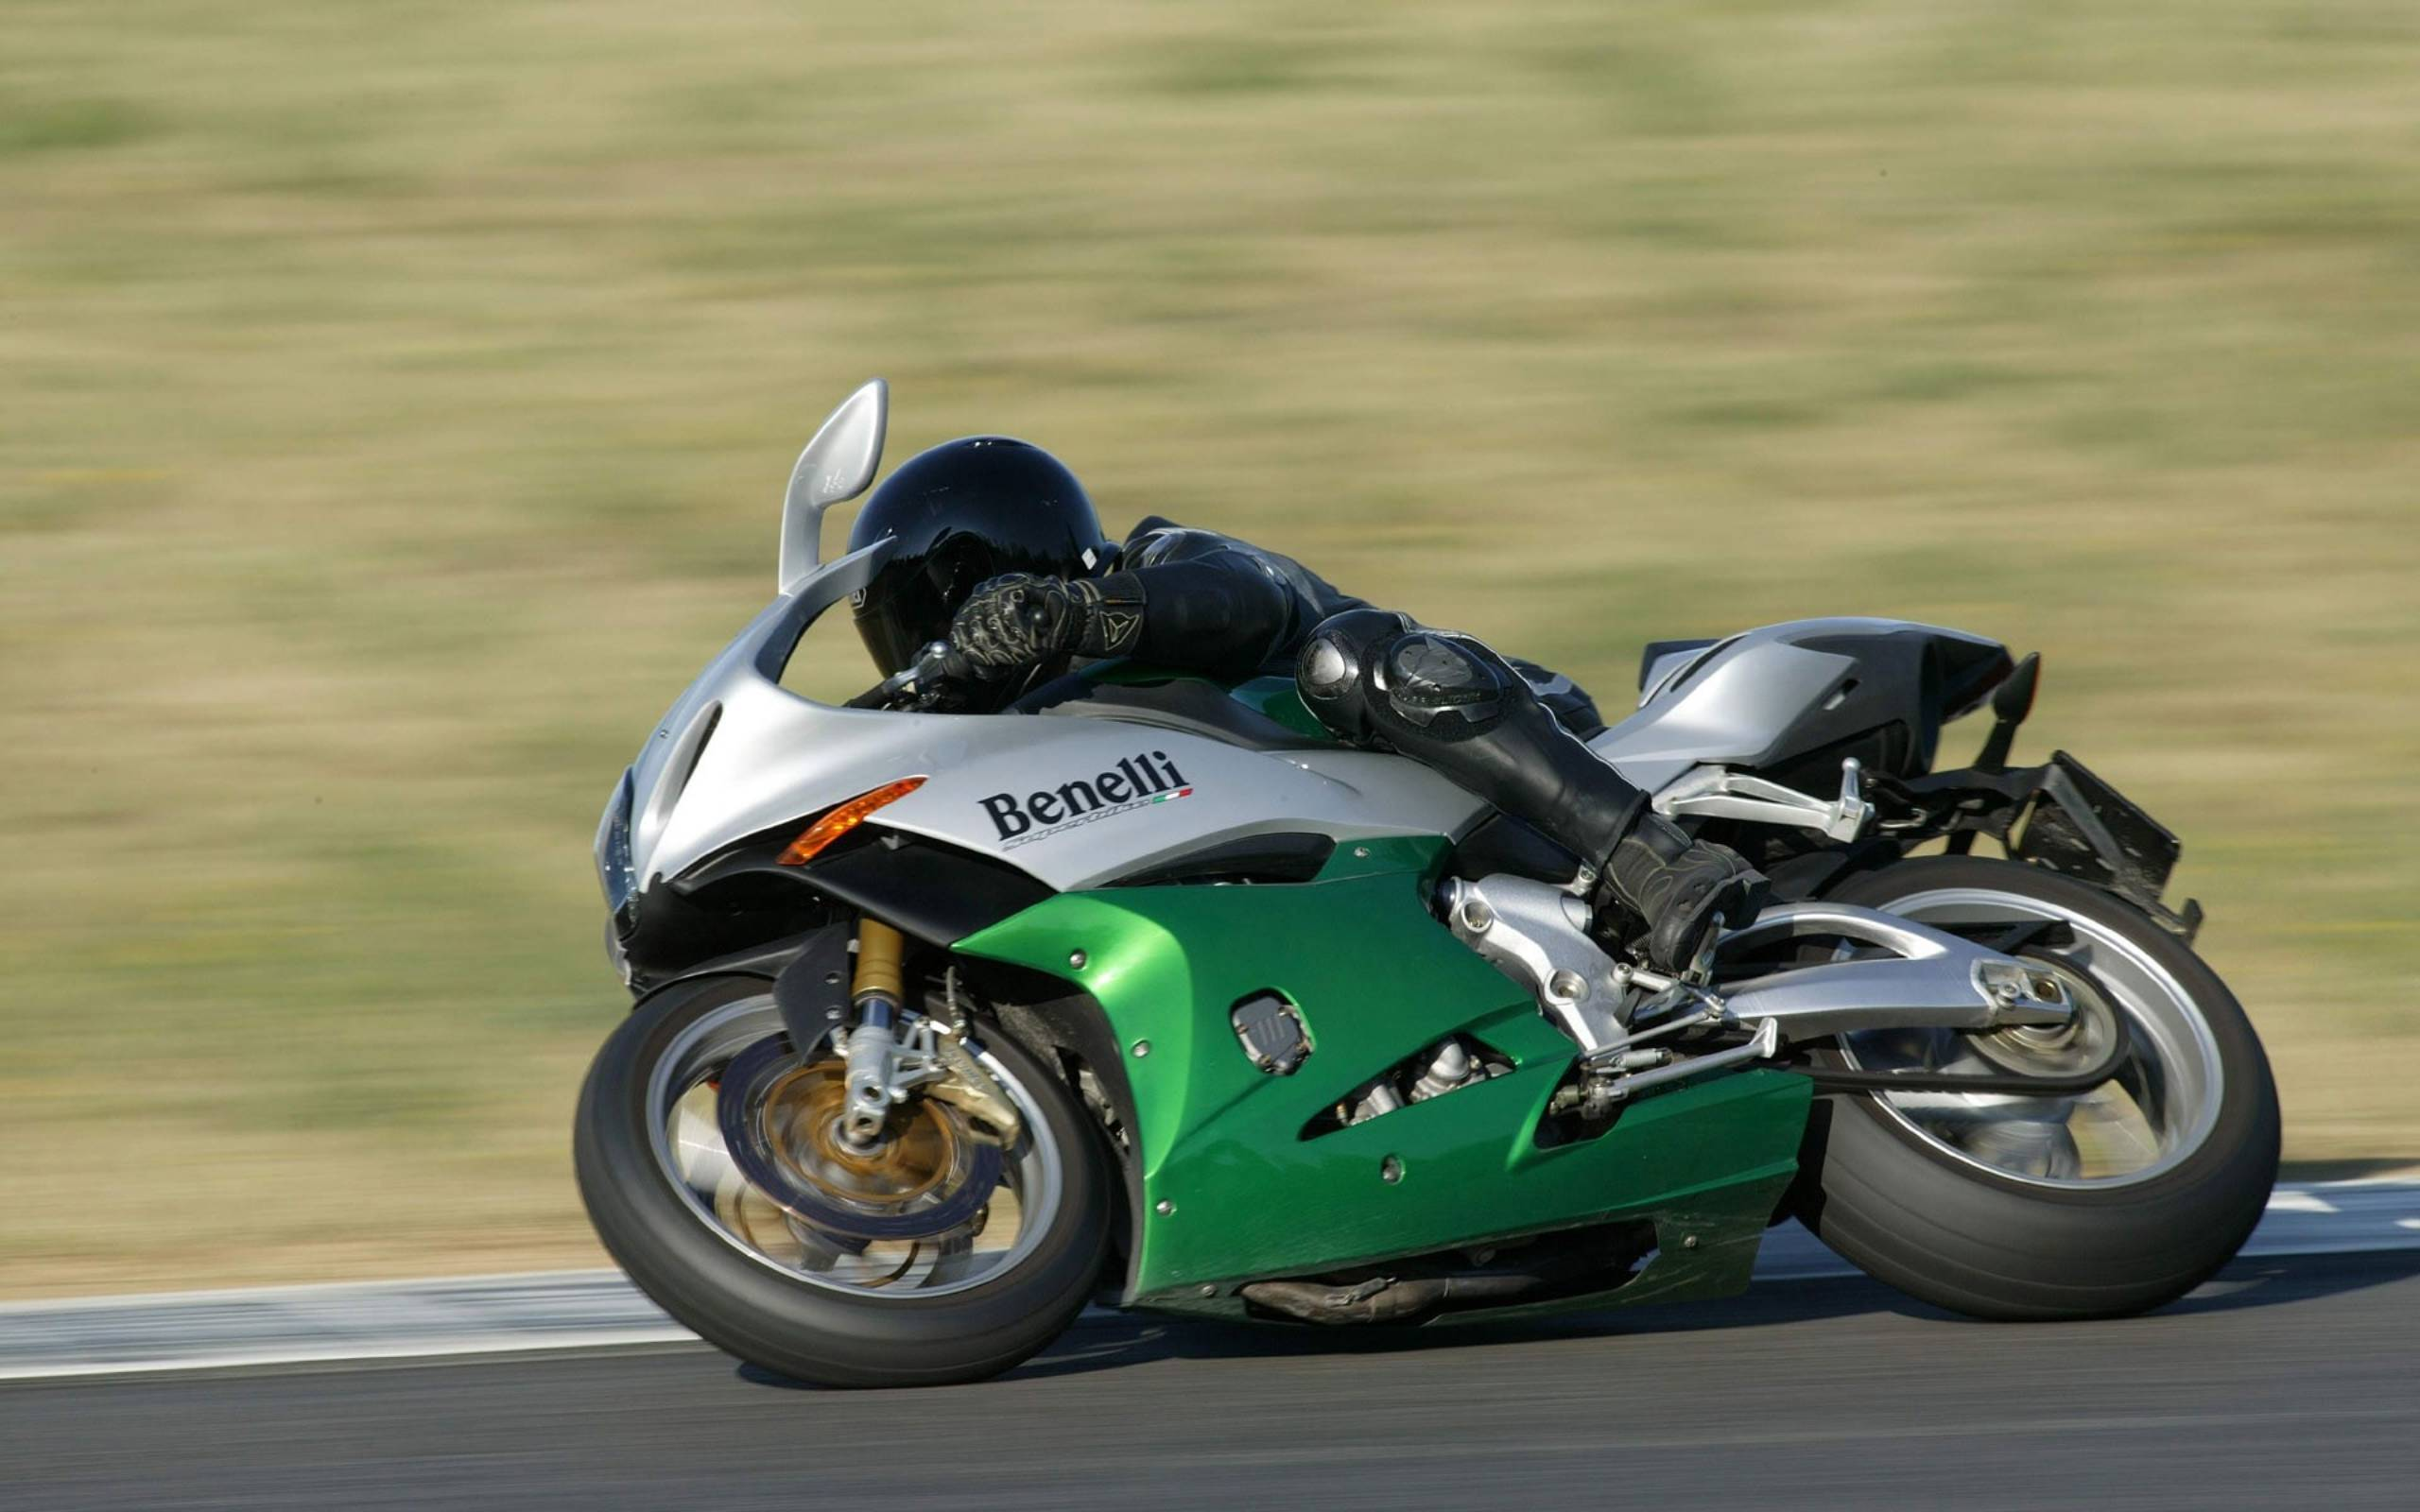 обои спортивный мотоцикл, Benelli, скорость, поворот картинки фото